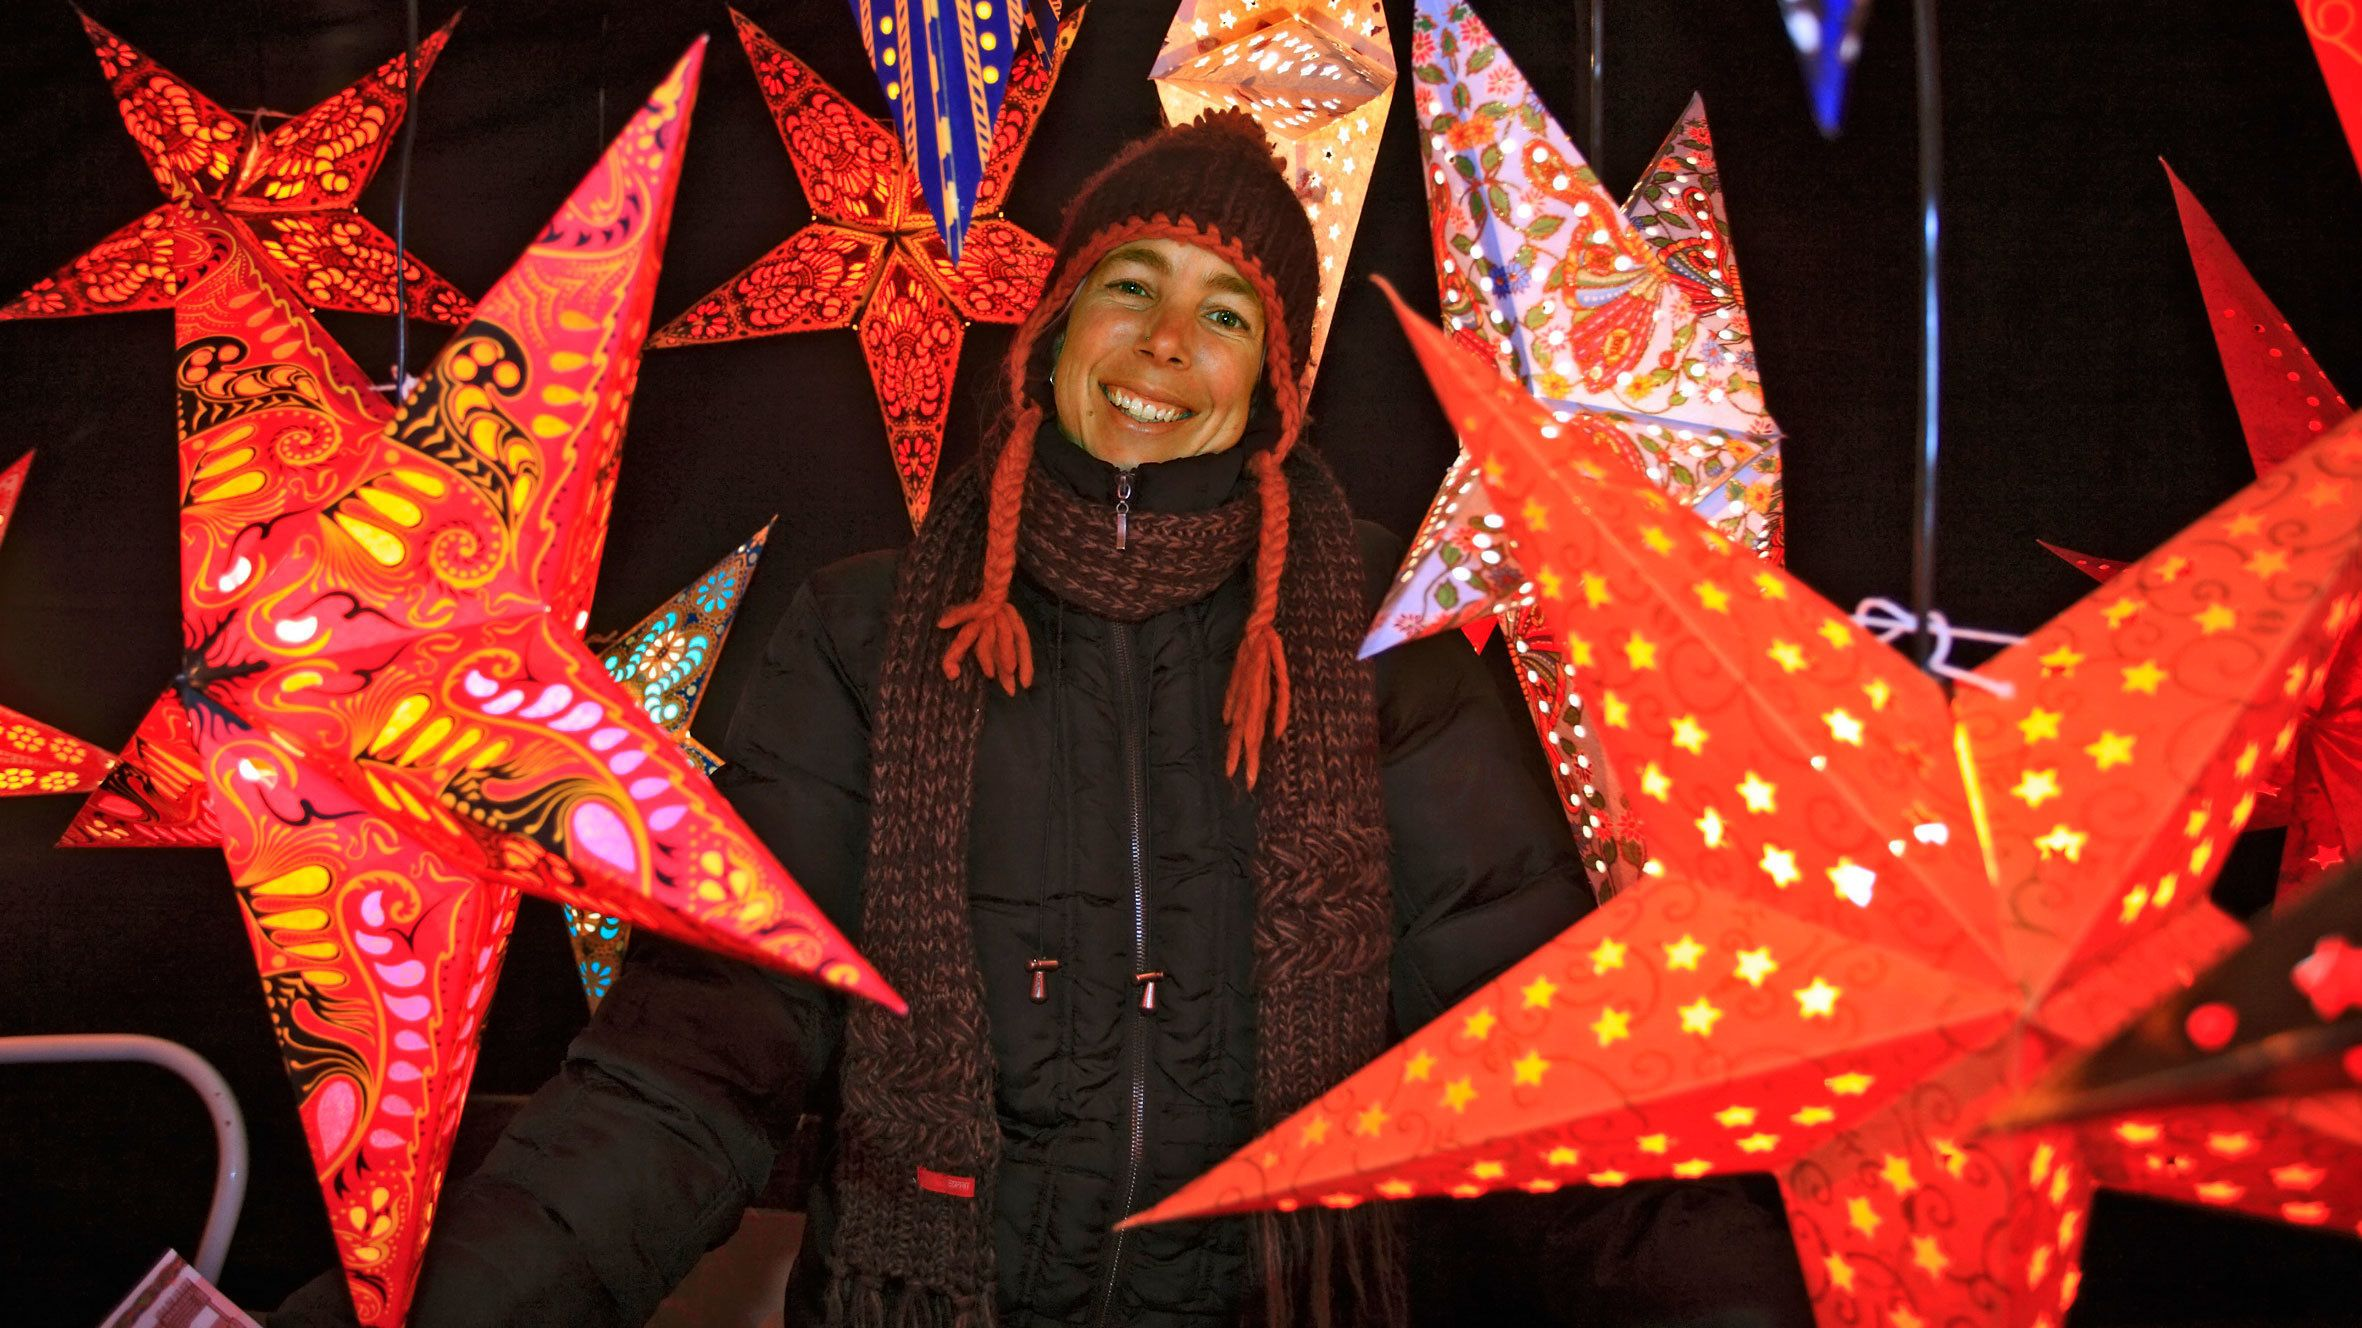 Starry night in Munich